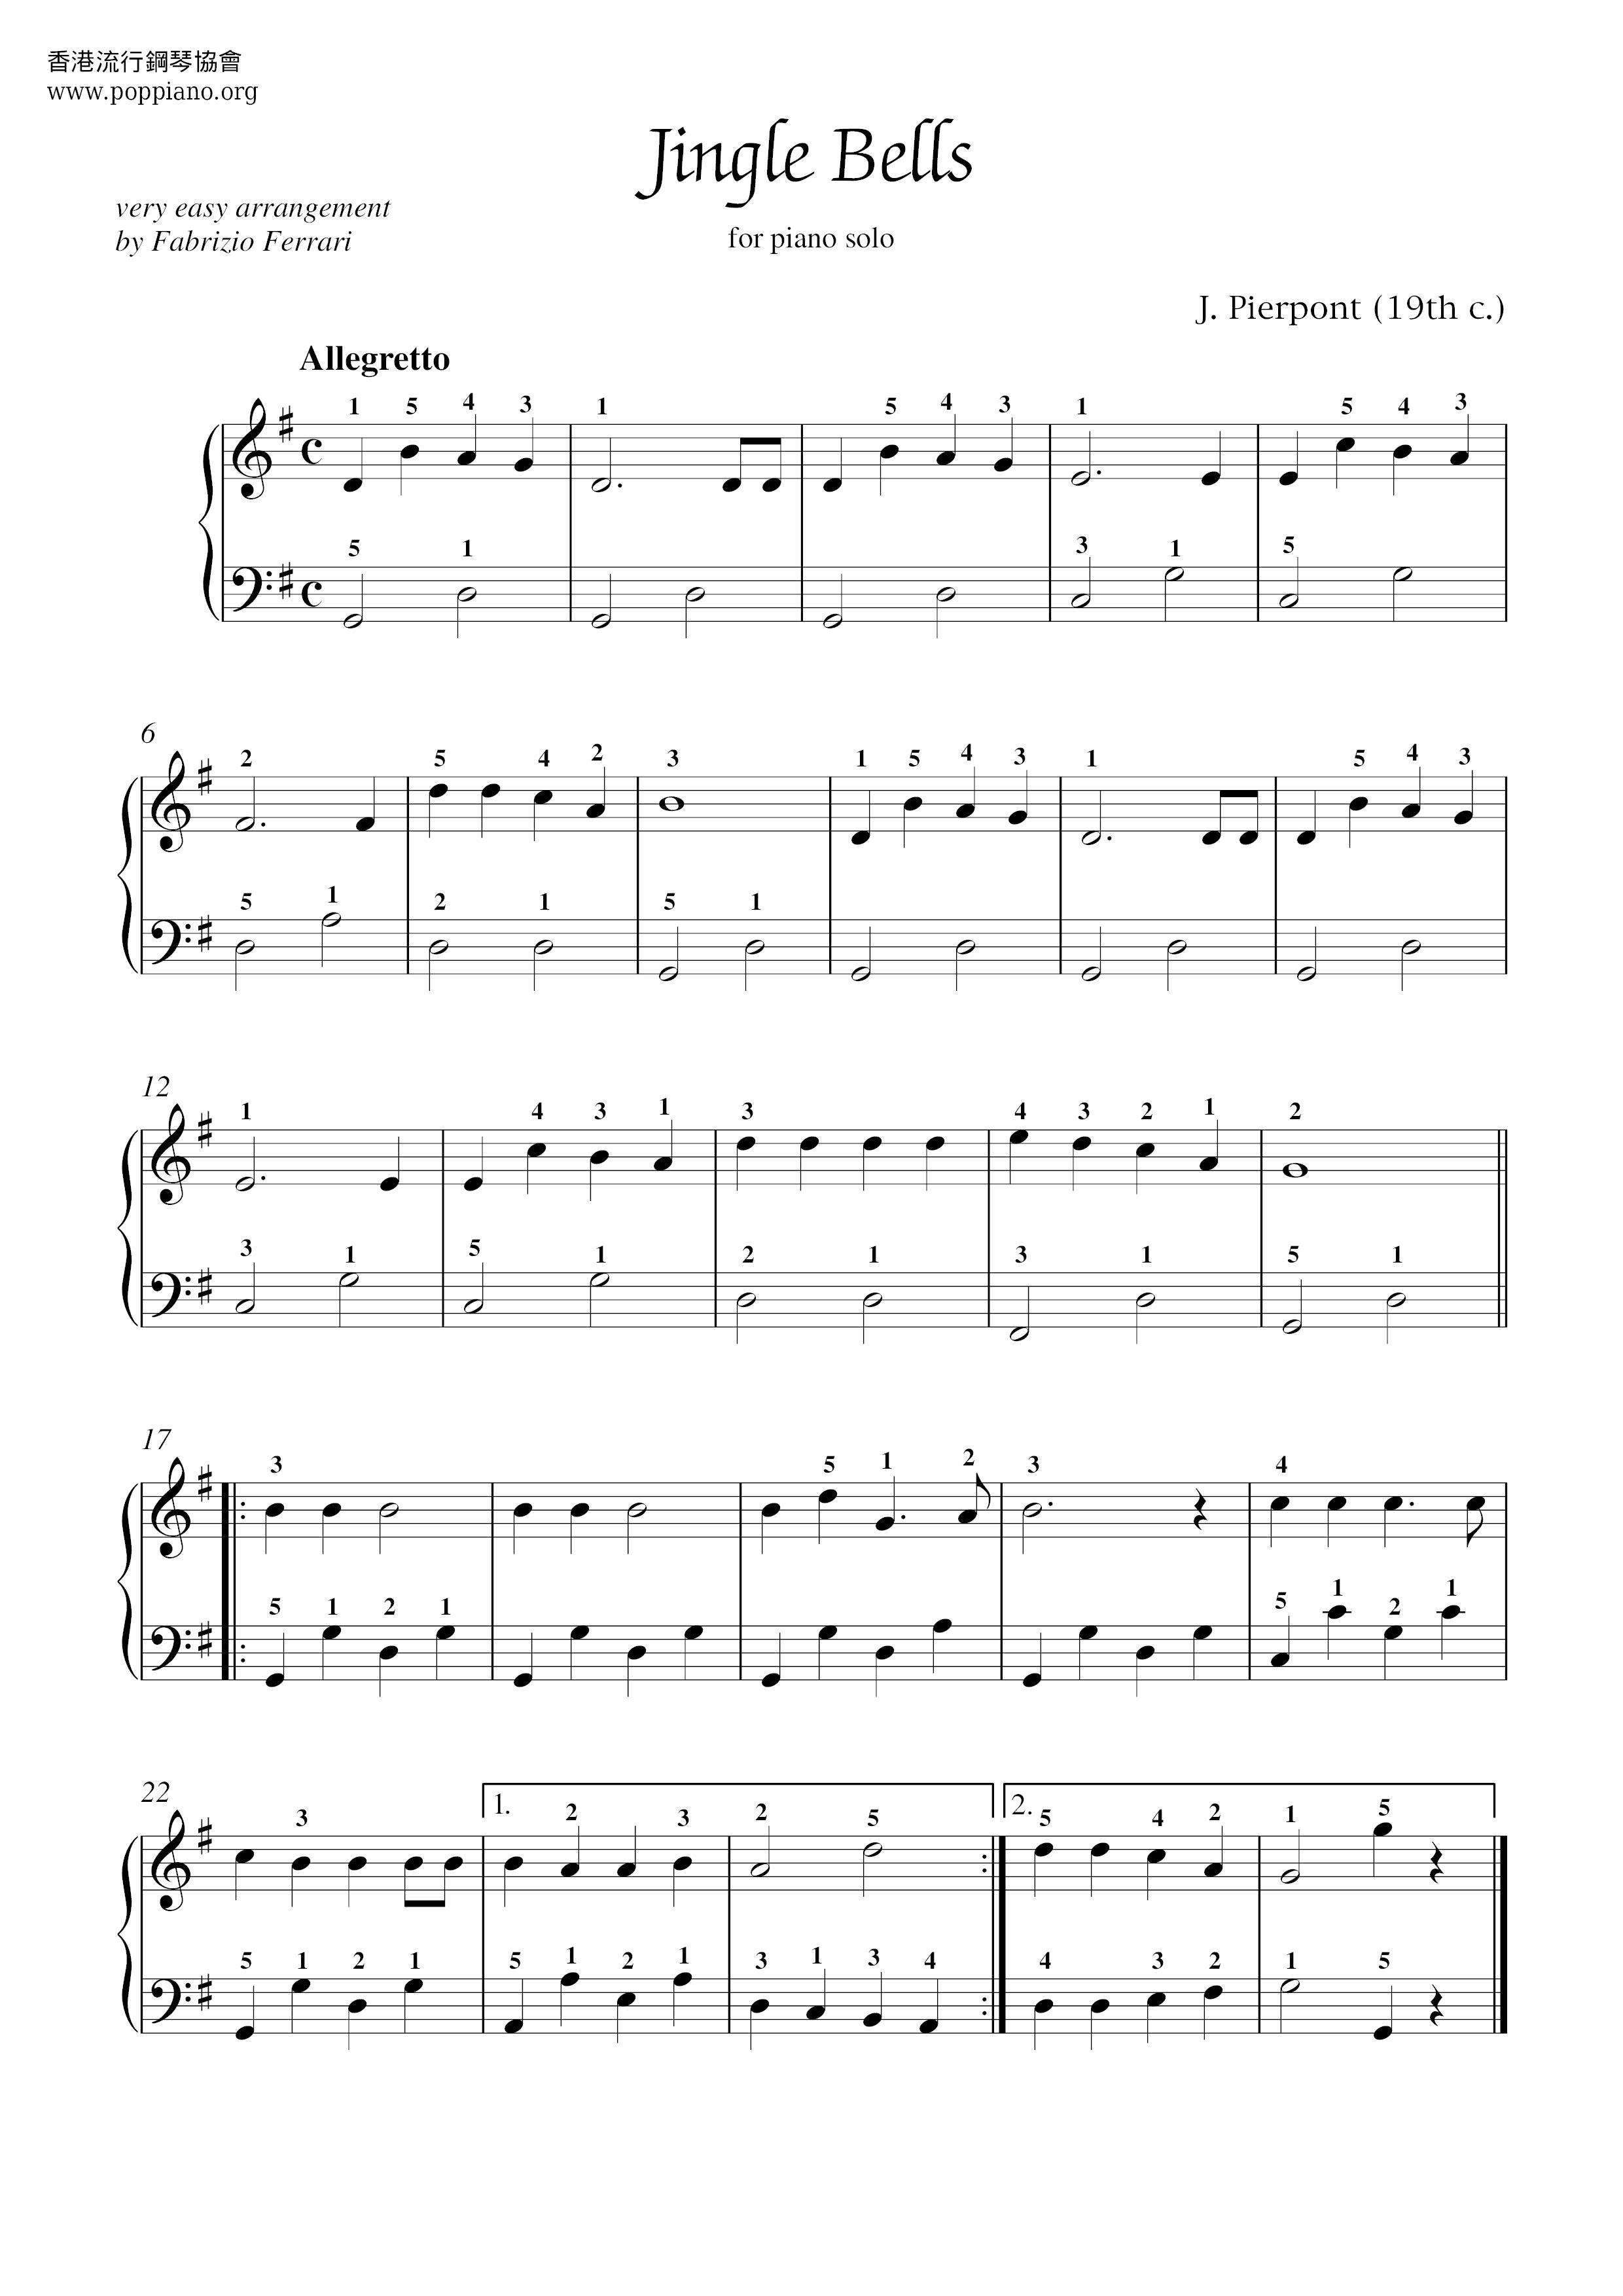 Christmas-Jingle Bells Sheet Music pdf, - Free Score Download ★